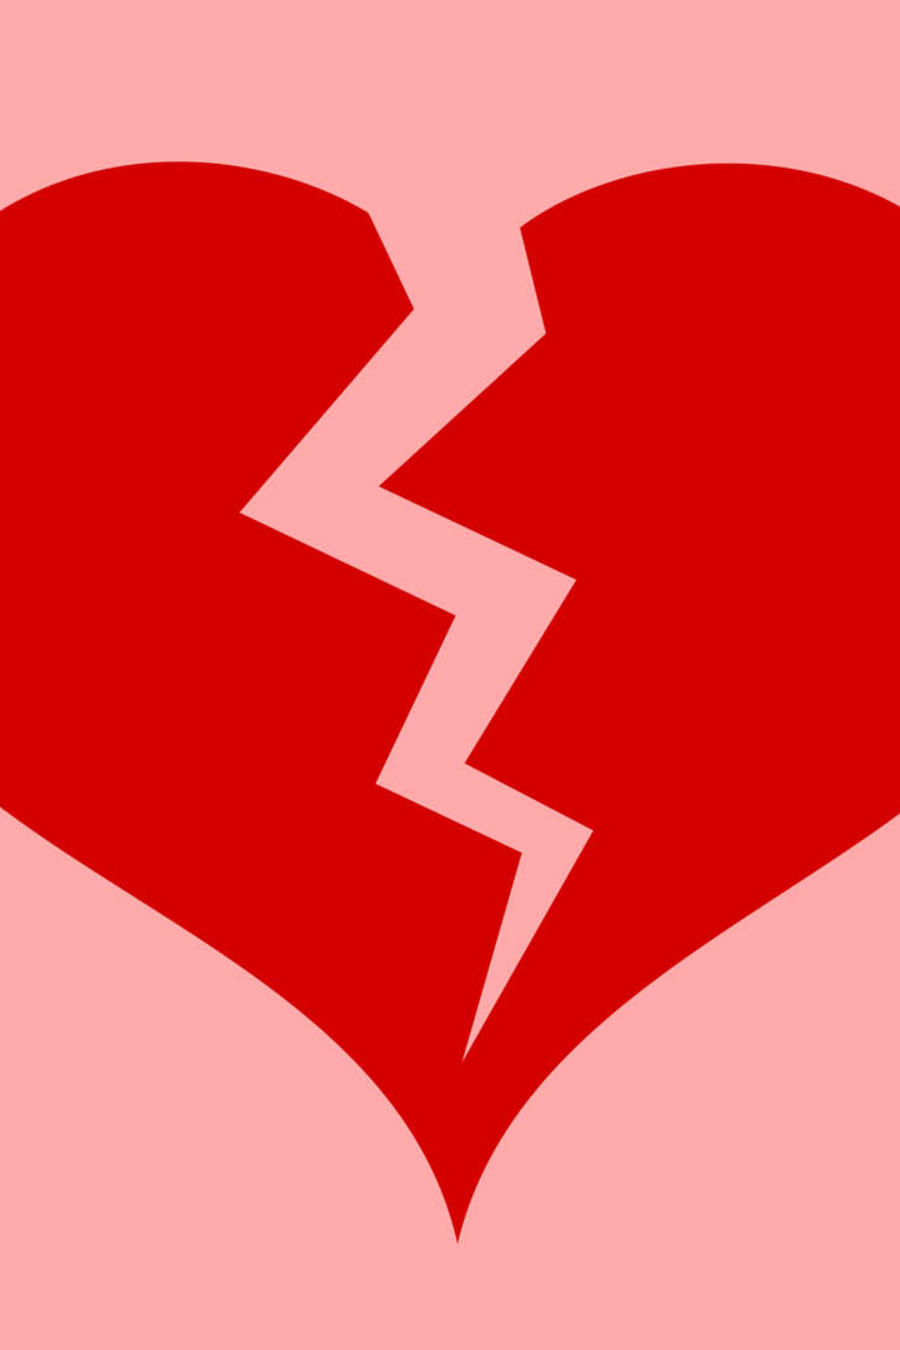 Corazón roto sobre fondo rosa